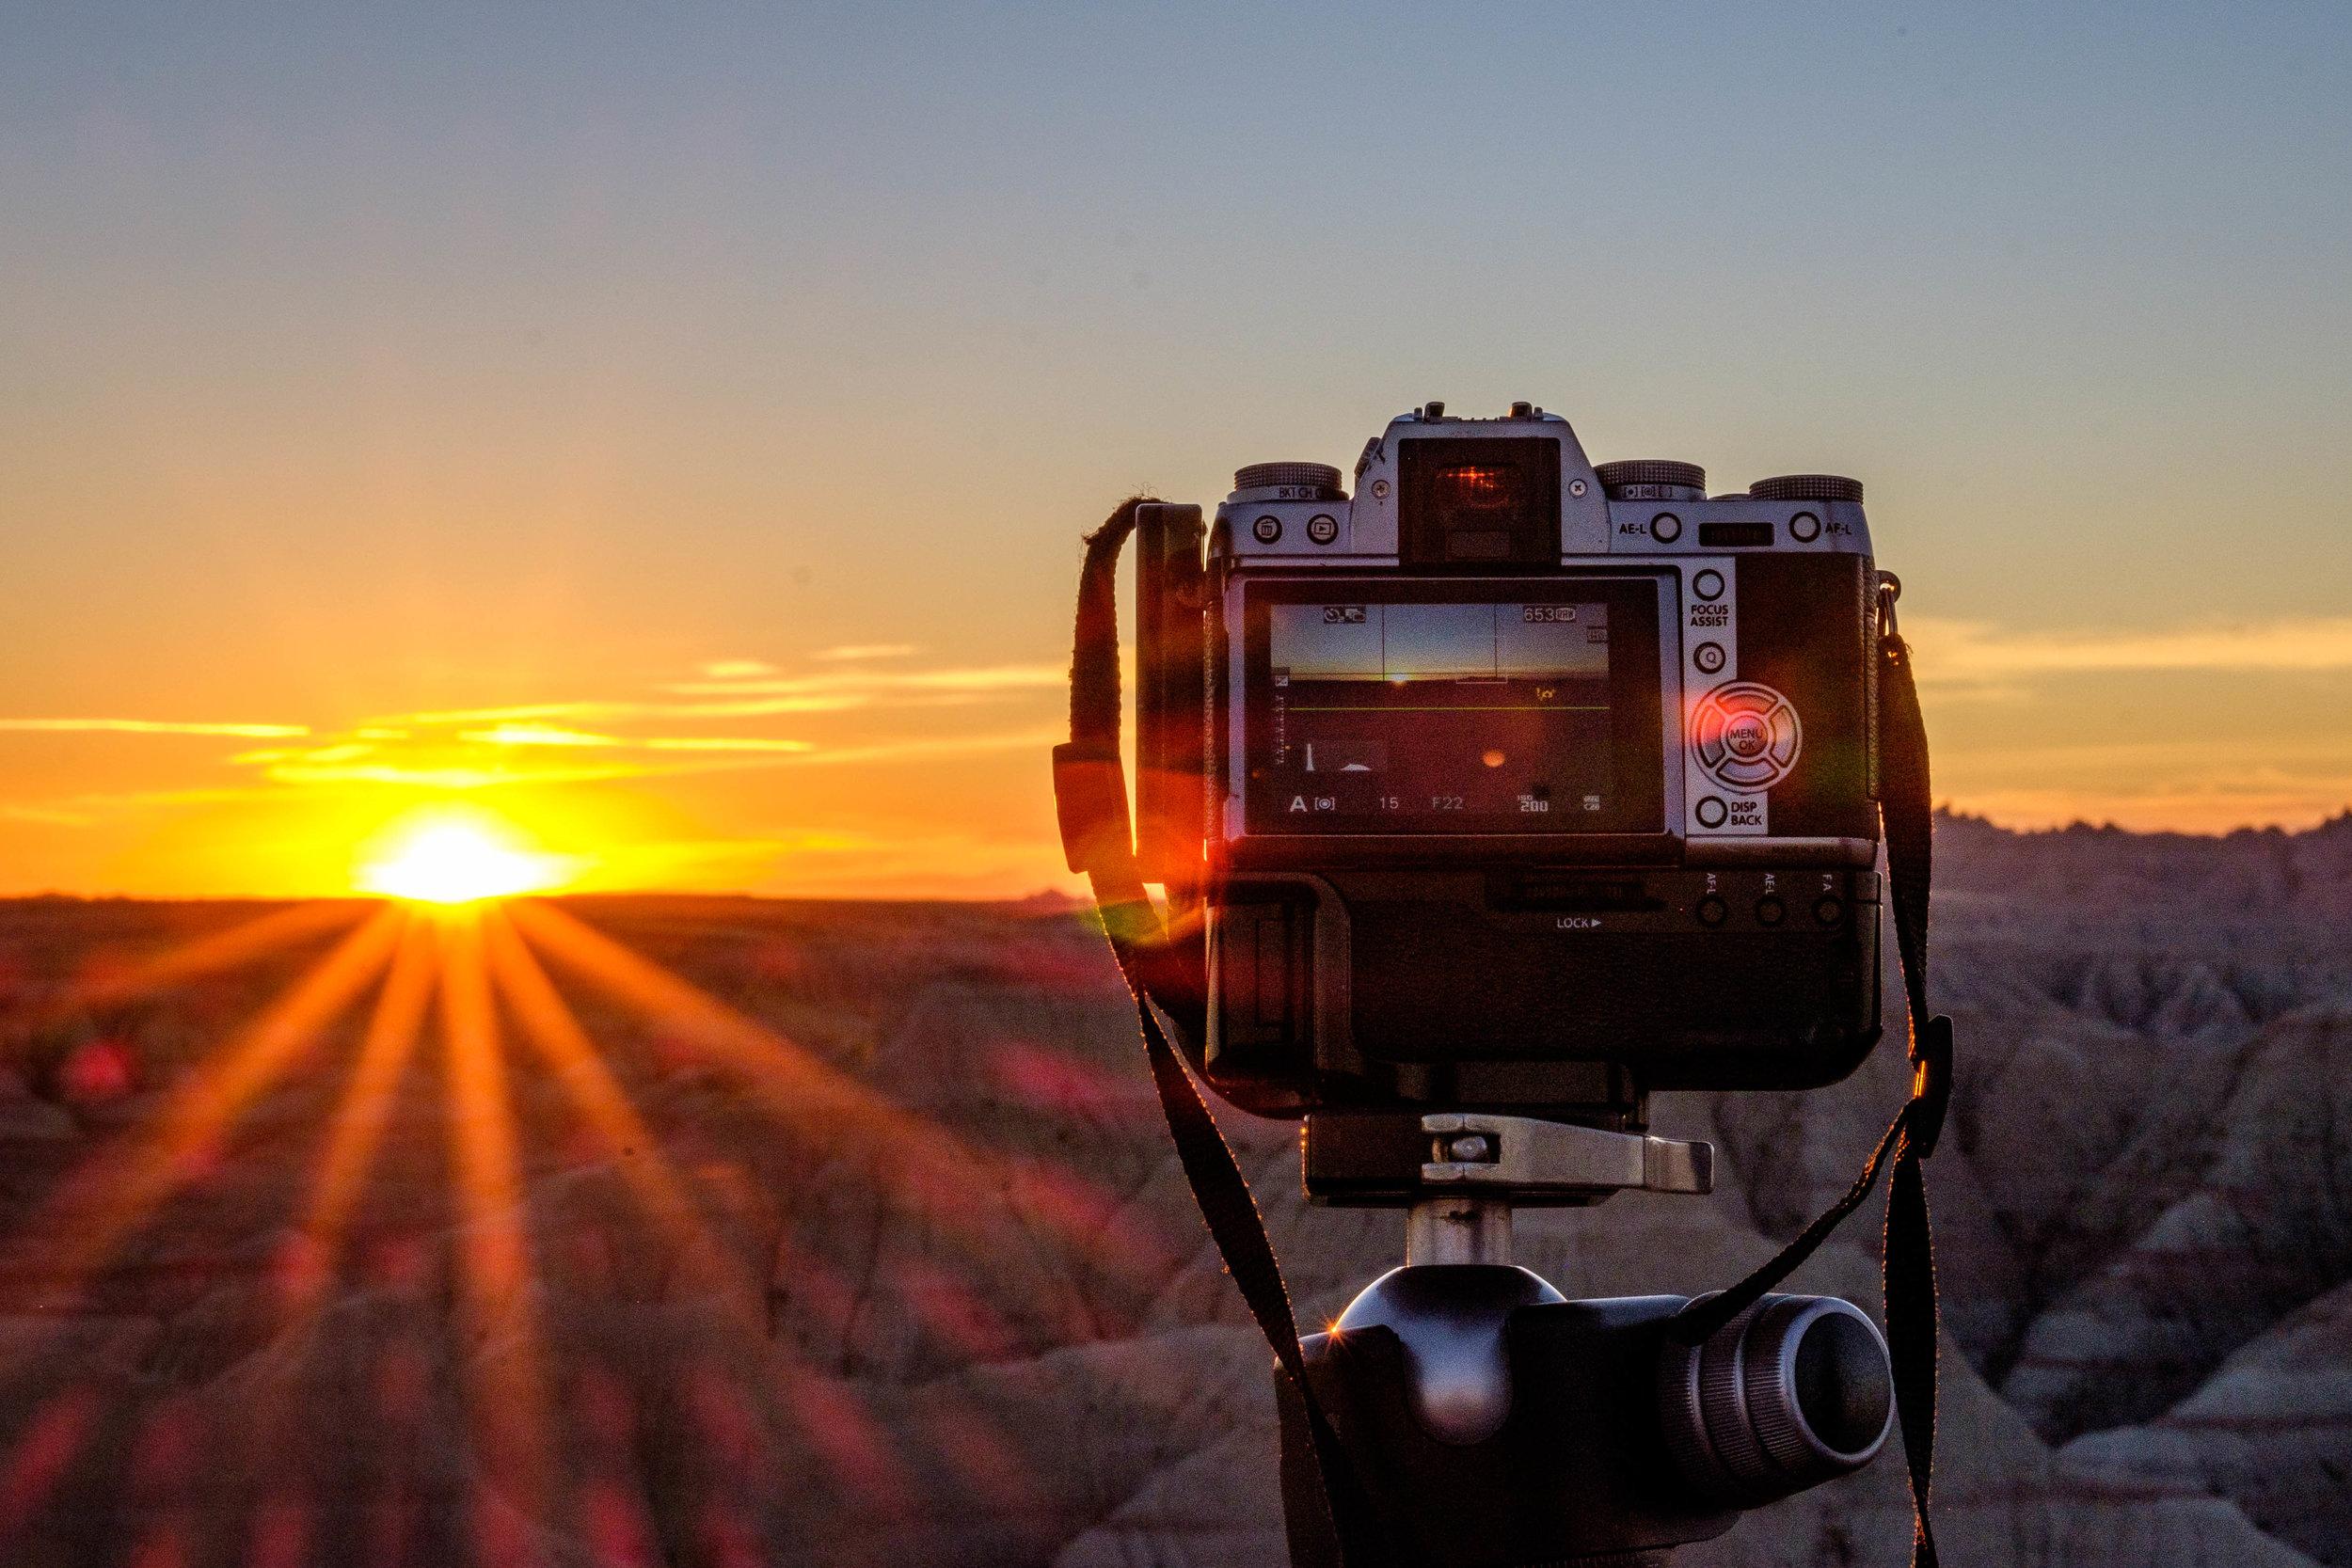 Catching the sunrise at Badlands National Park in South Dakota.